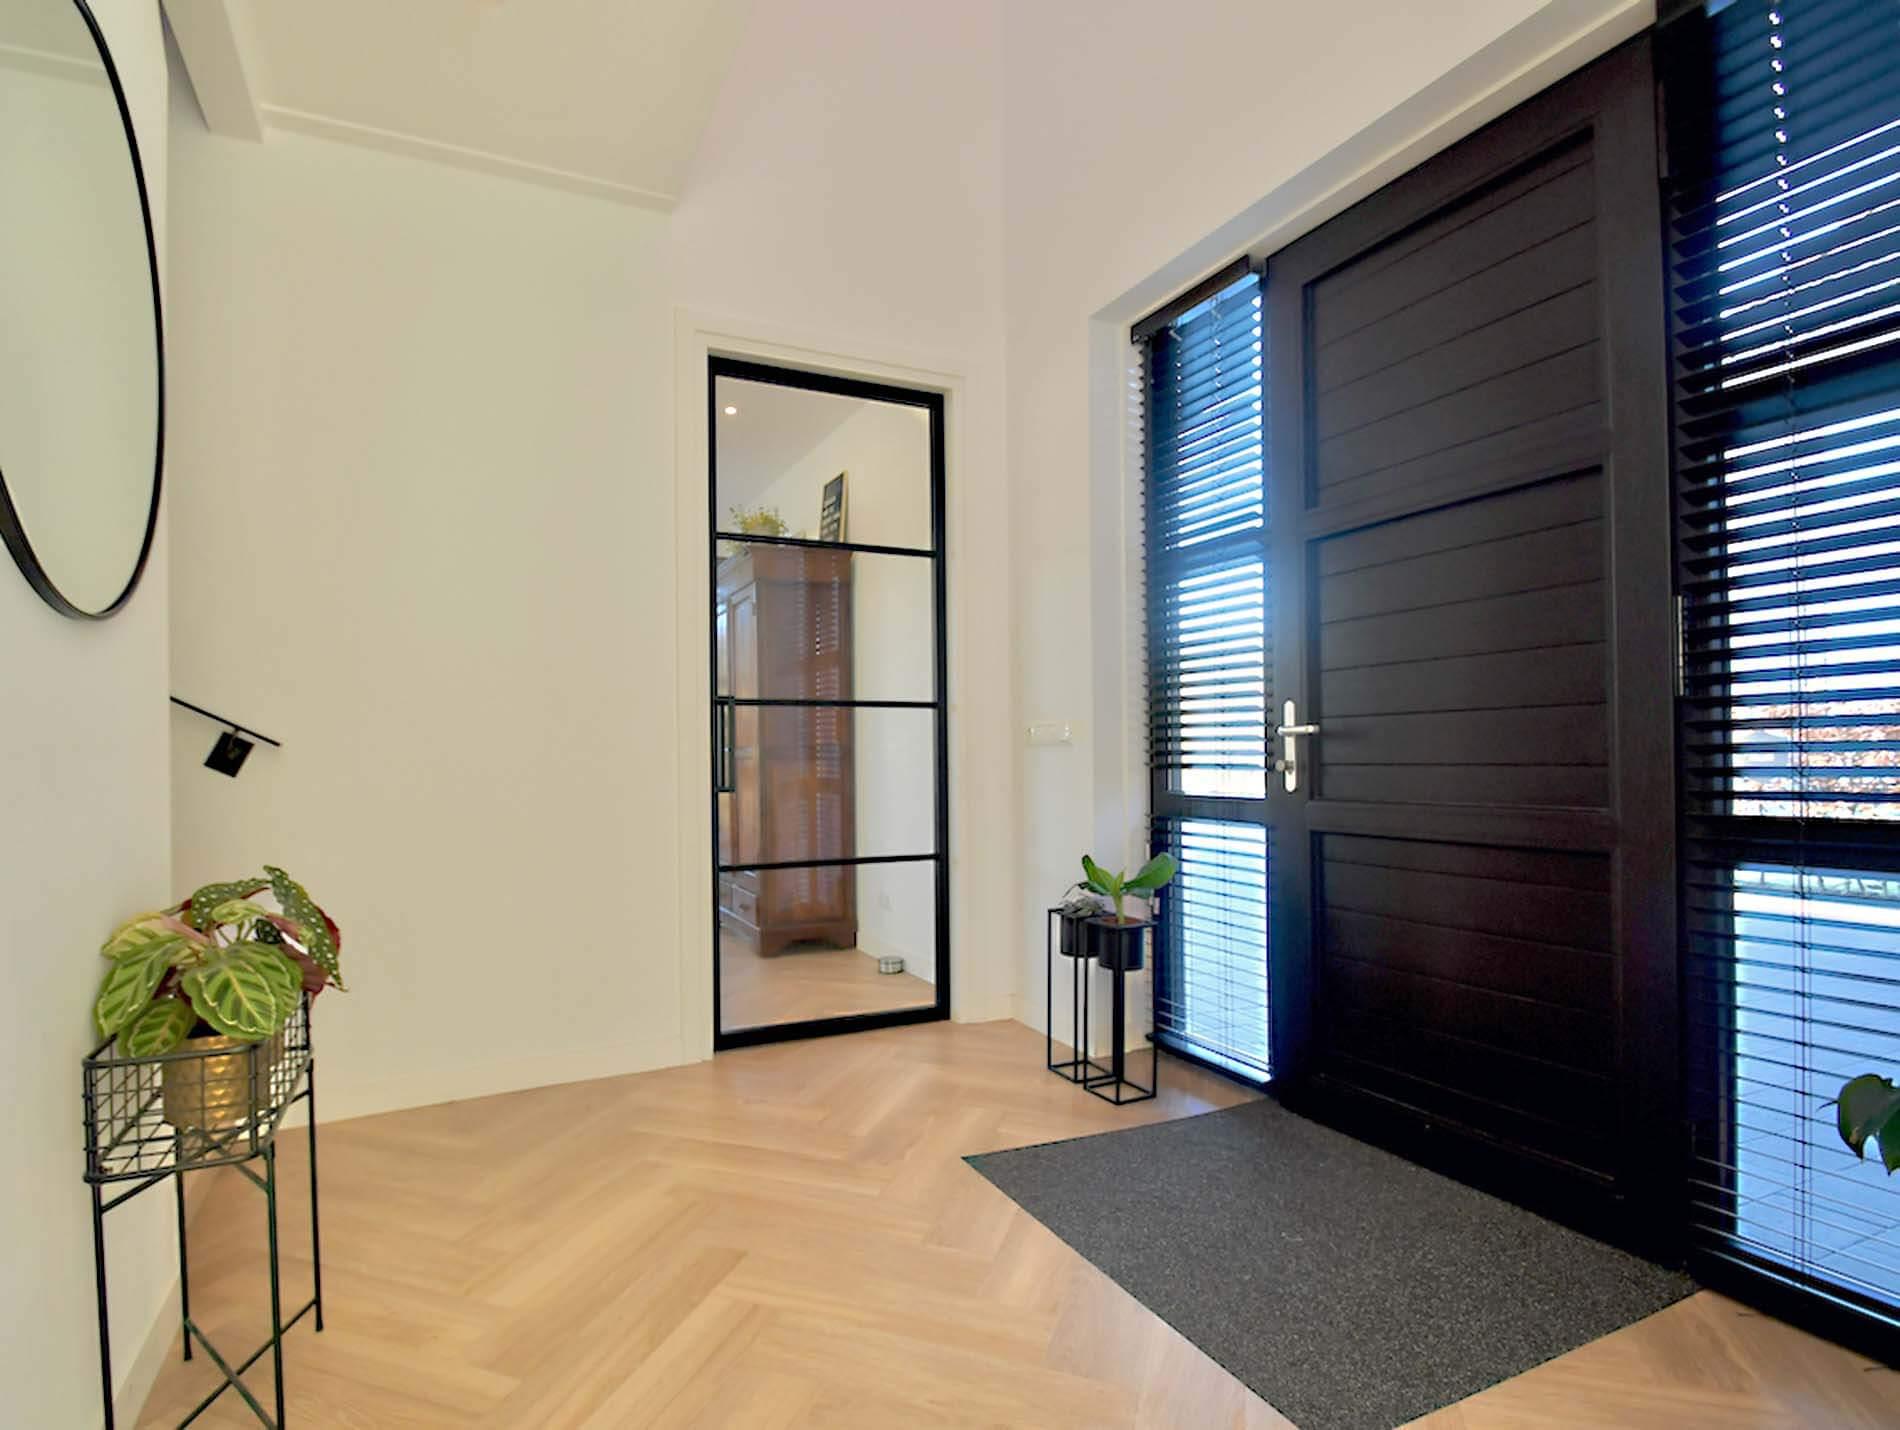 3. Interieur-drachten-nieuwbouw-woning-1900x1430p.jpg